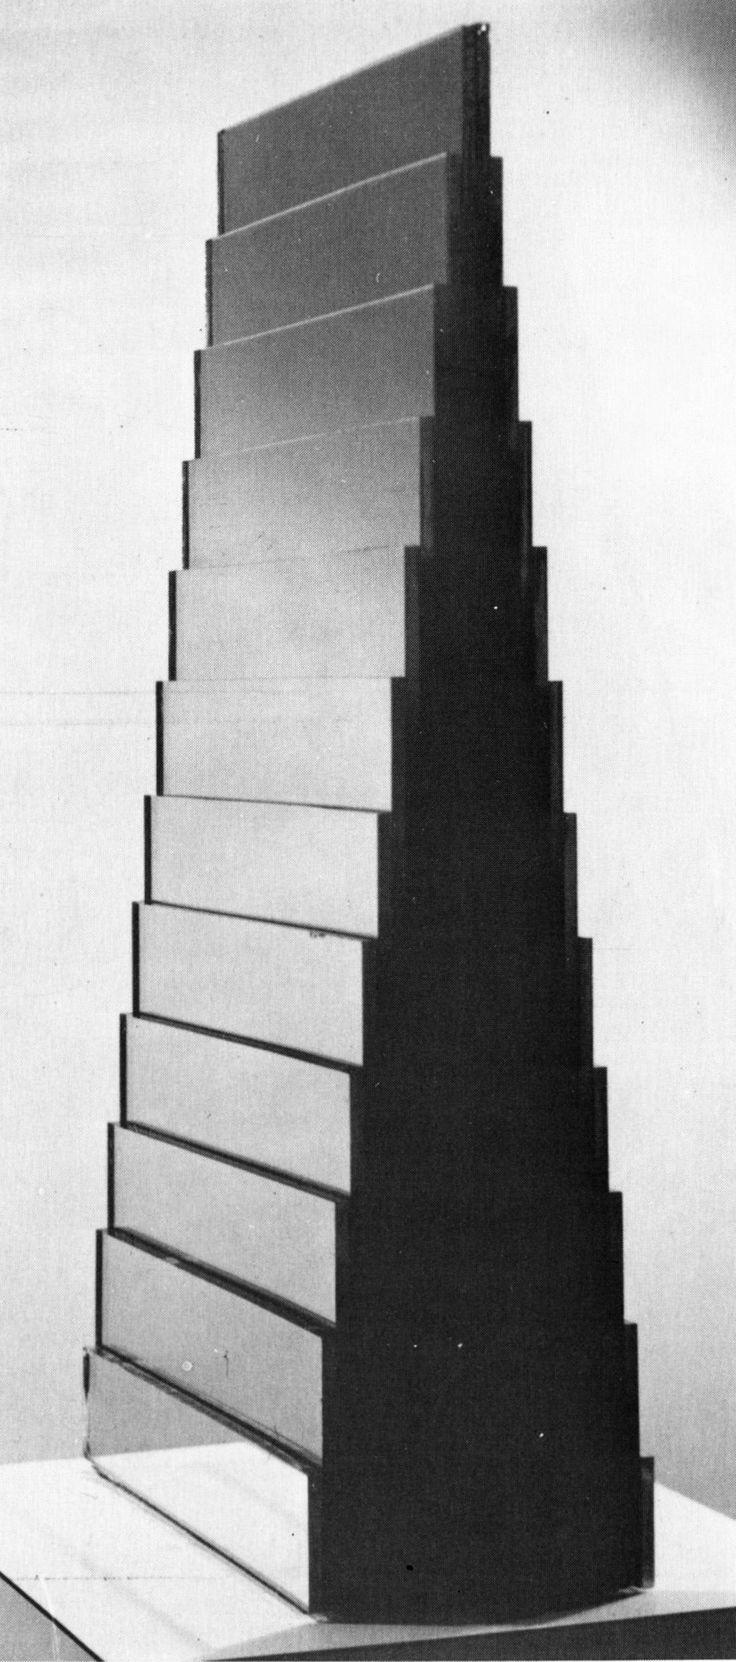 Robert Smithson, Ziggurat Mirror, 1966